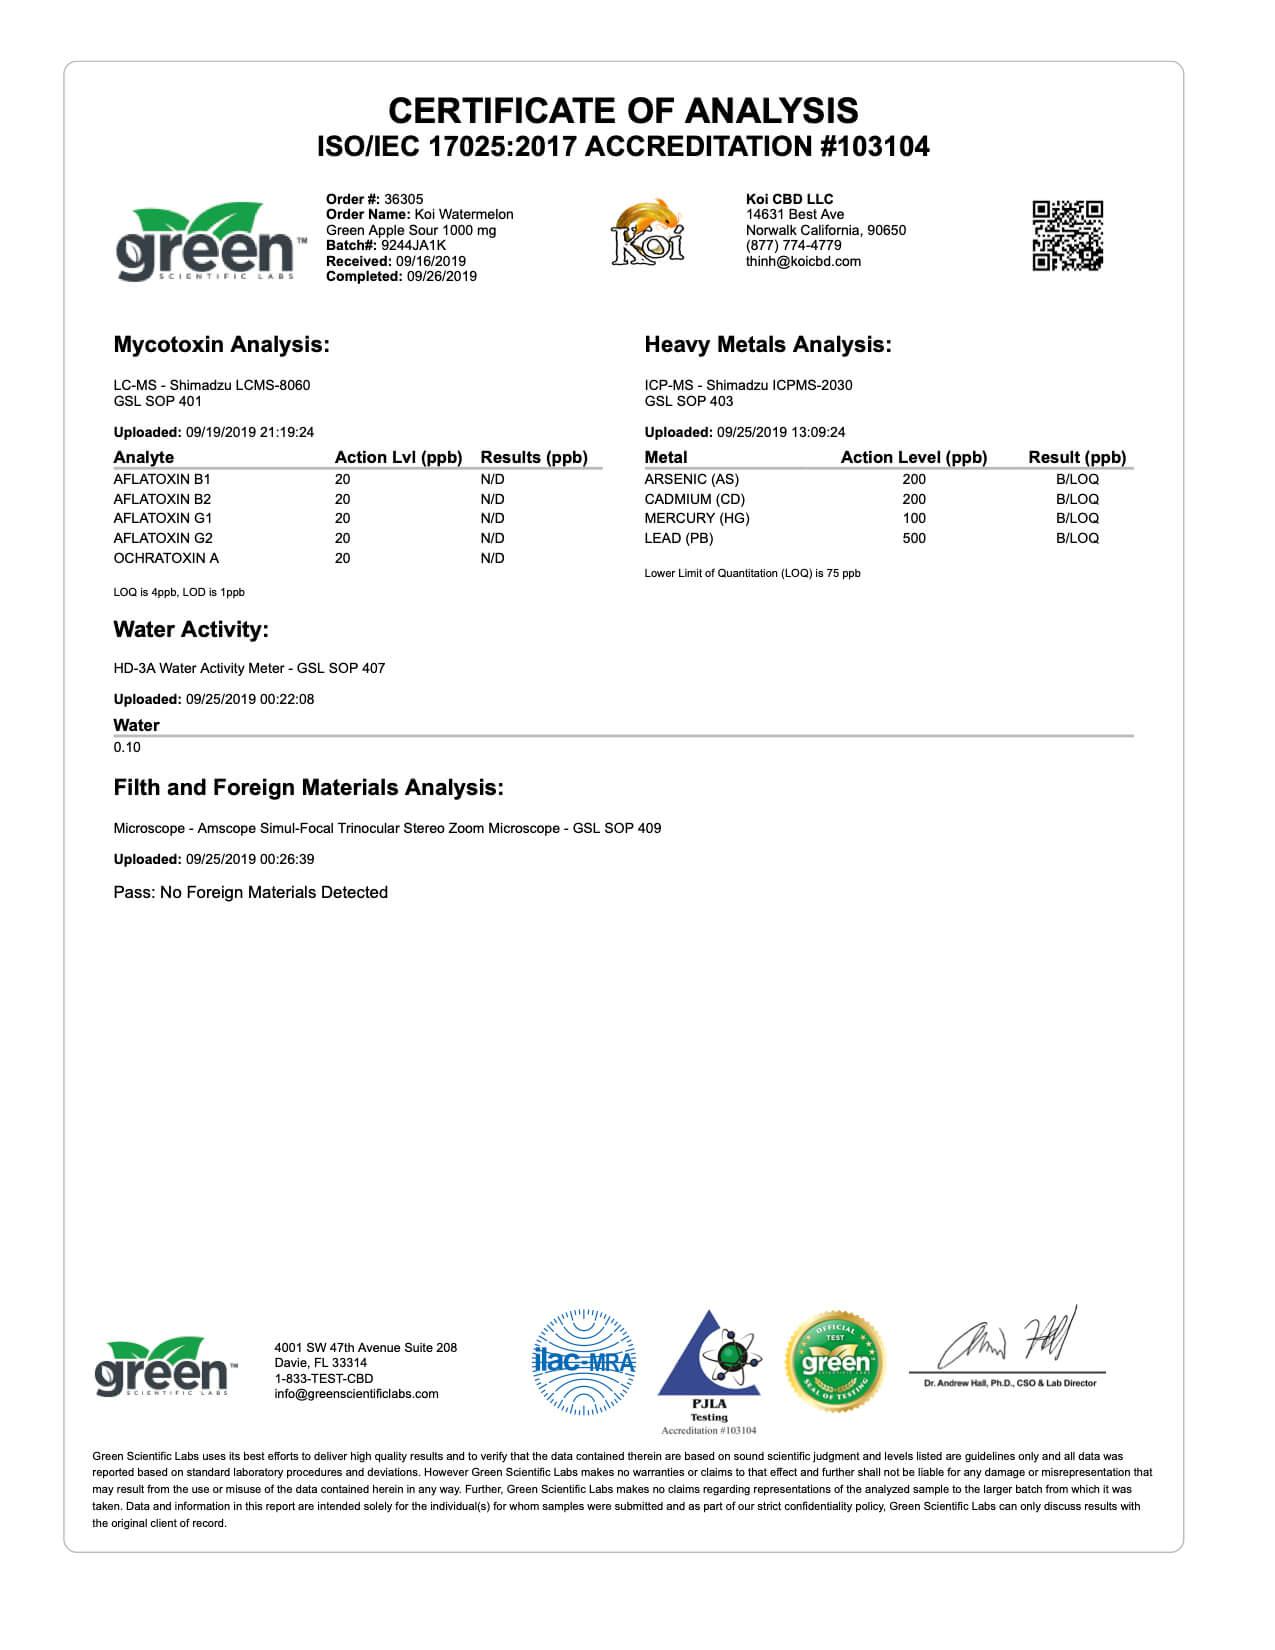 Koi CBD Watermelon Green Apple Sour Vape Oil 1000mg page6